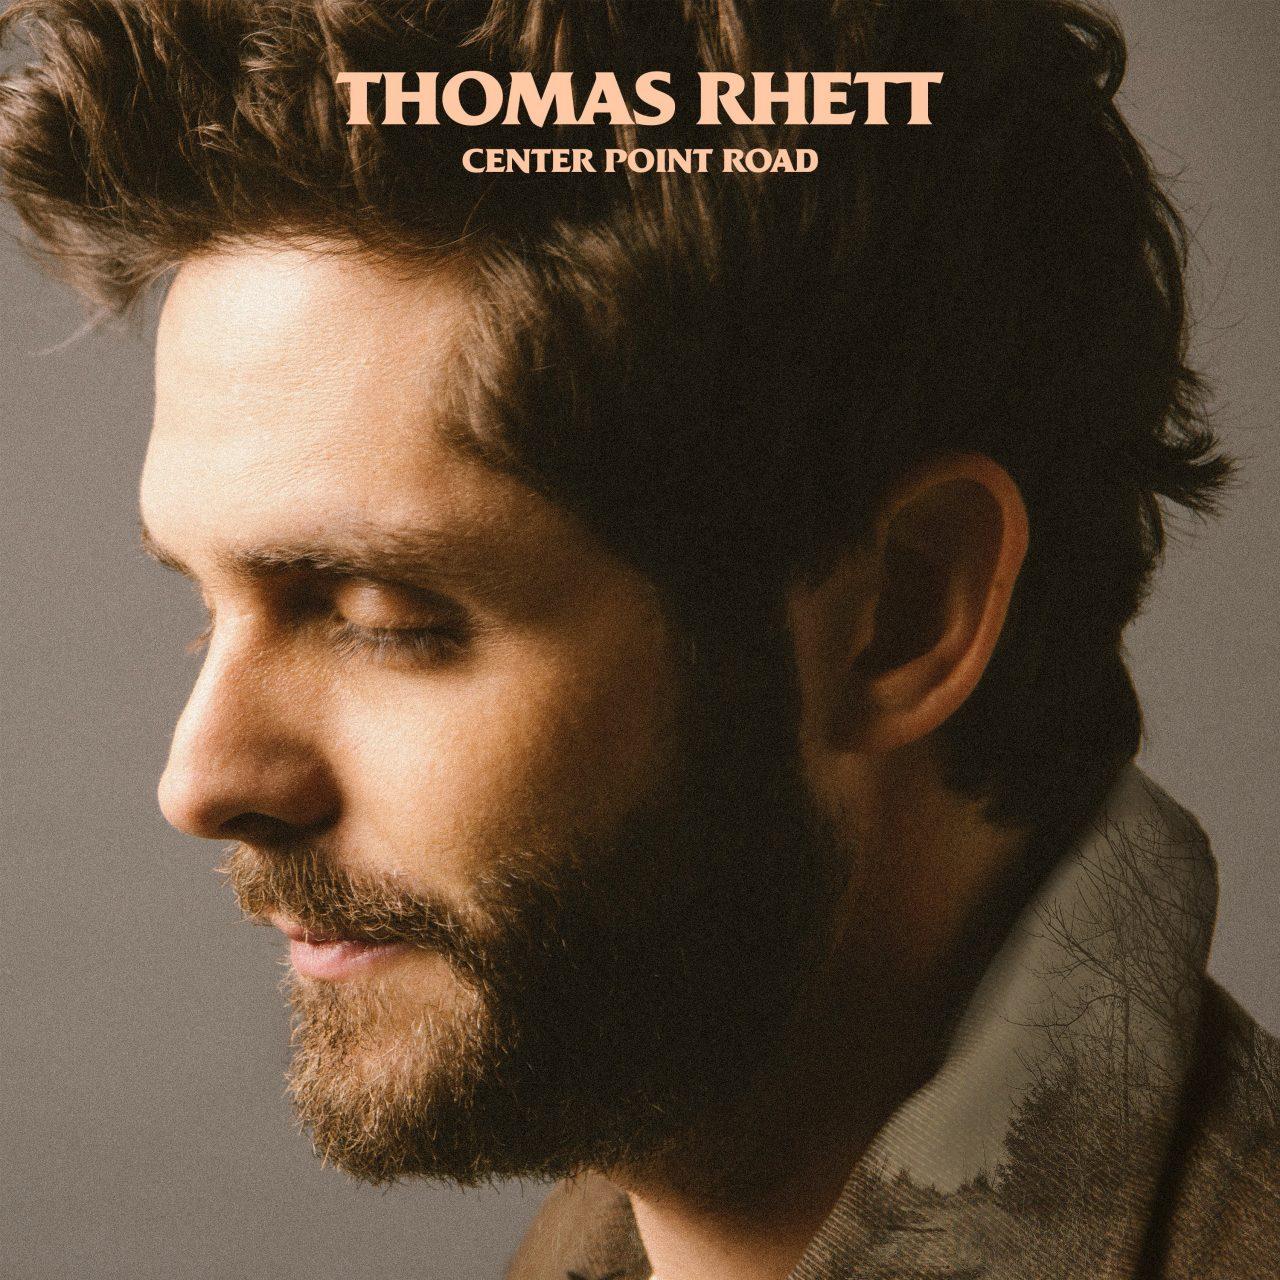 Thomas Rhett Shares Collaborative Track Listing for 'Center Point Road'